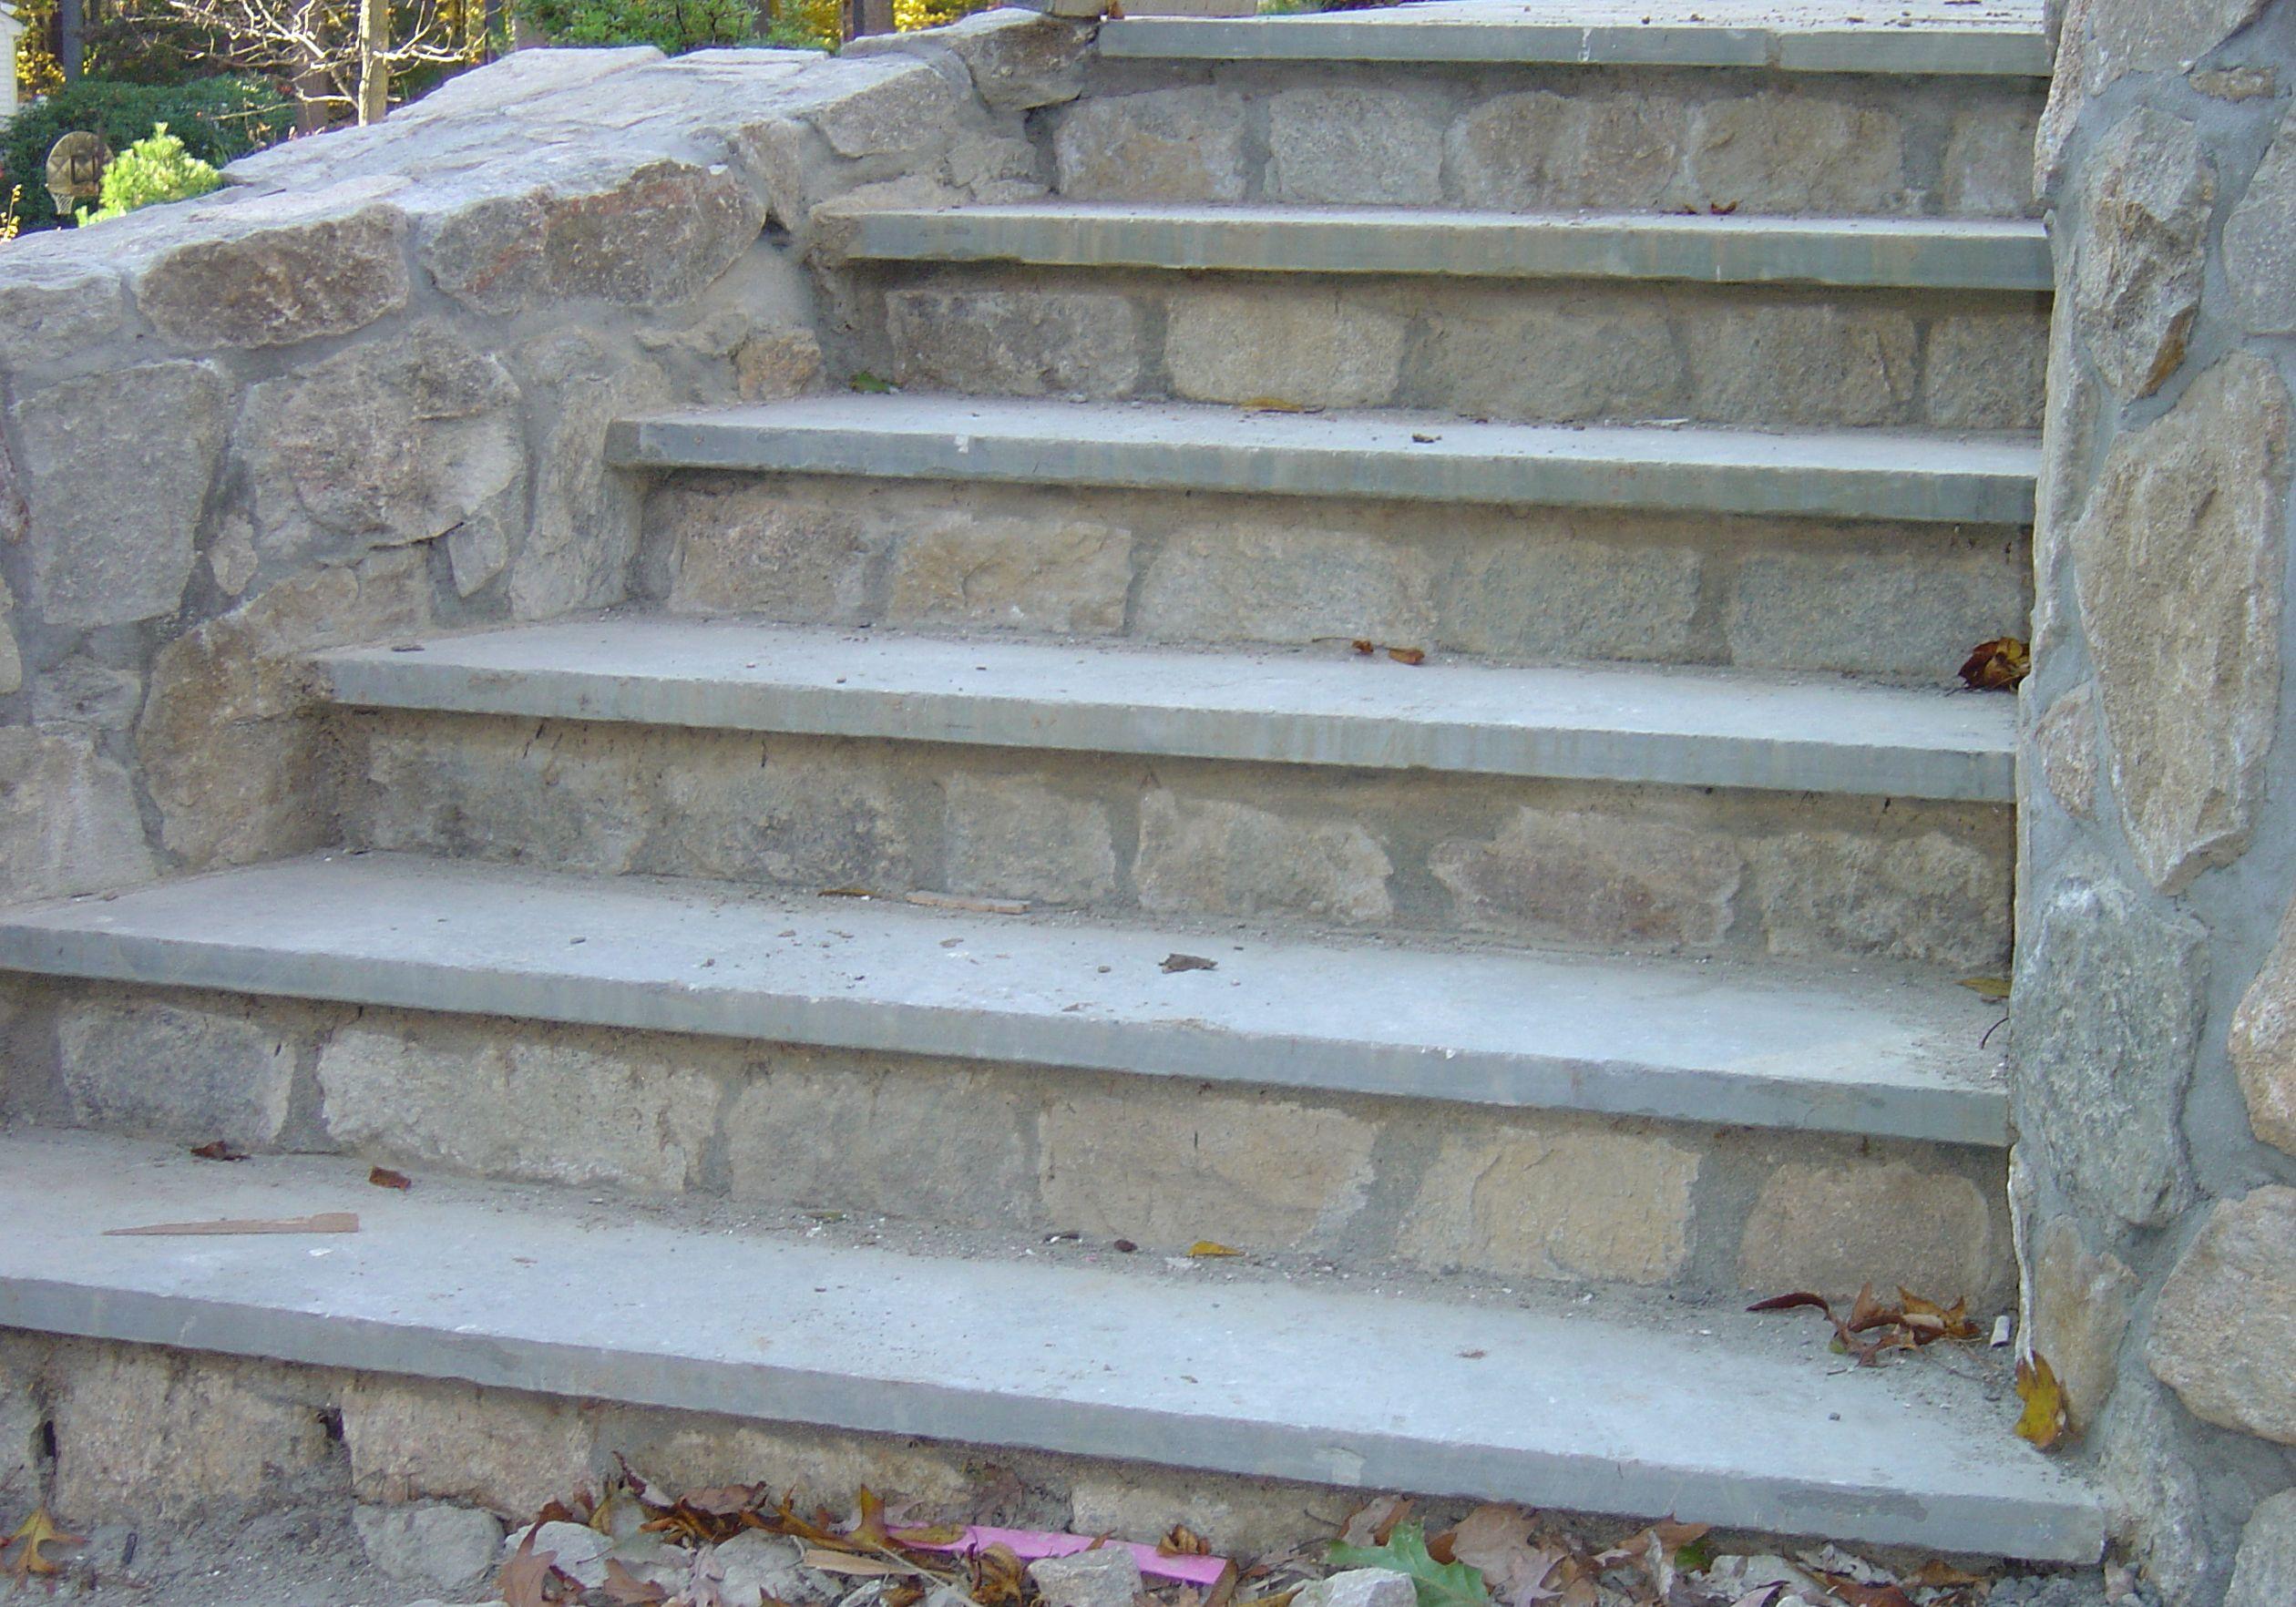 Chimney Cricket - Stone Porch Steps Pavers Brick